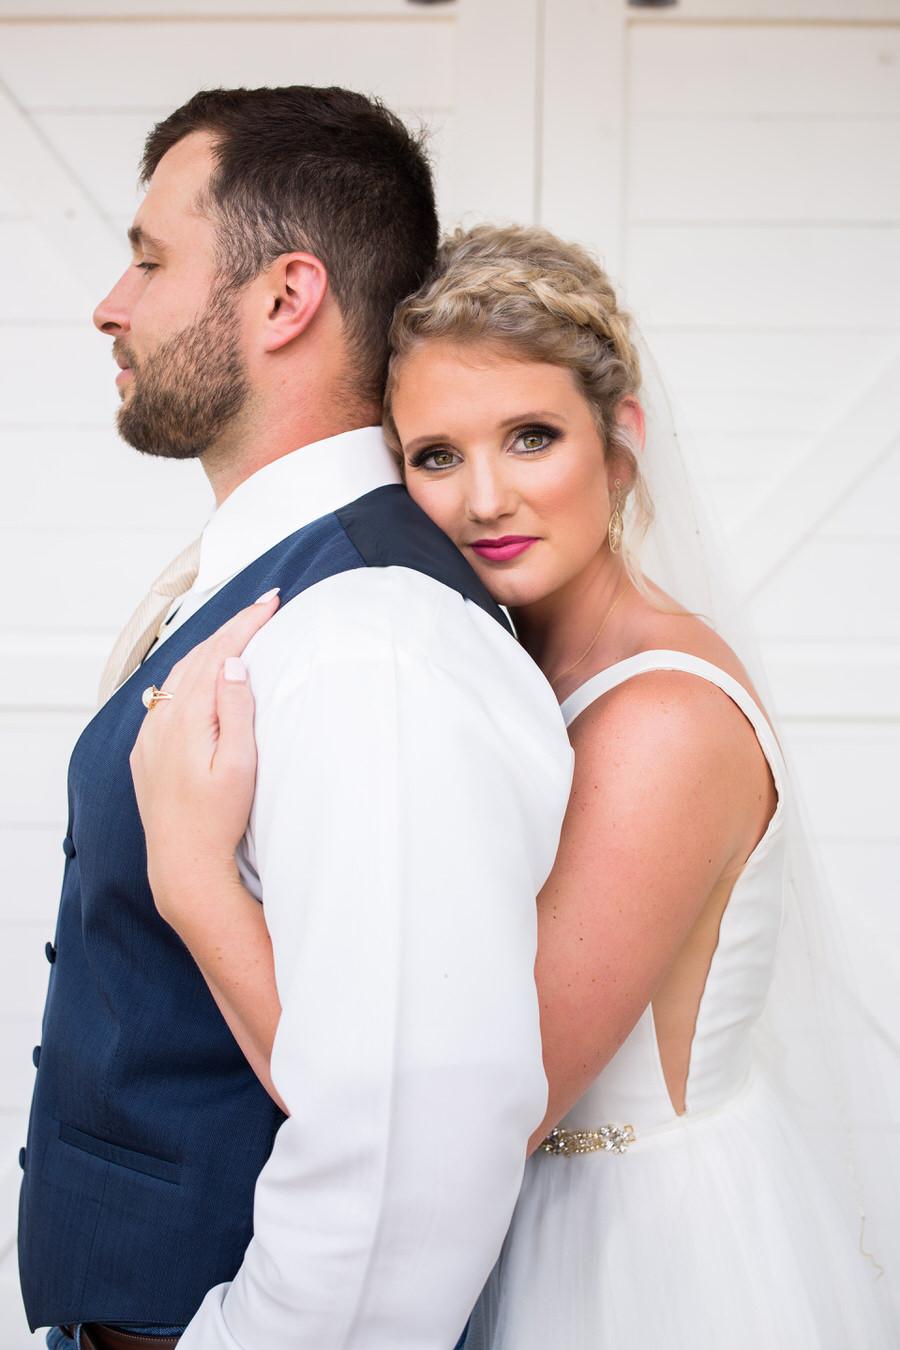 New Braunfels Texas bride and groom